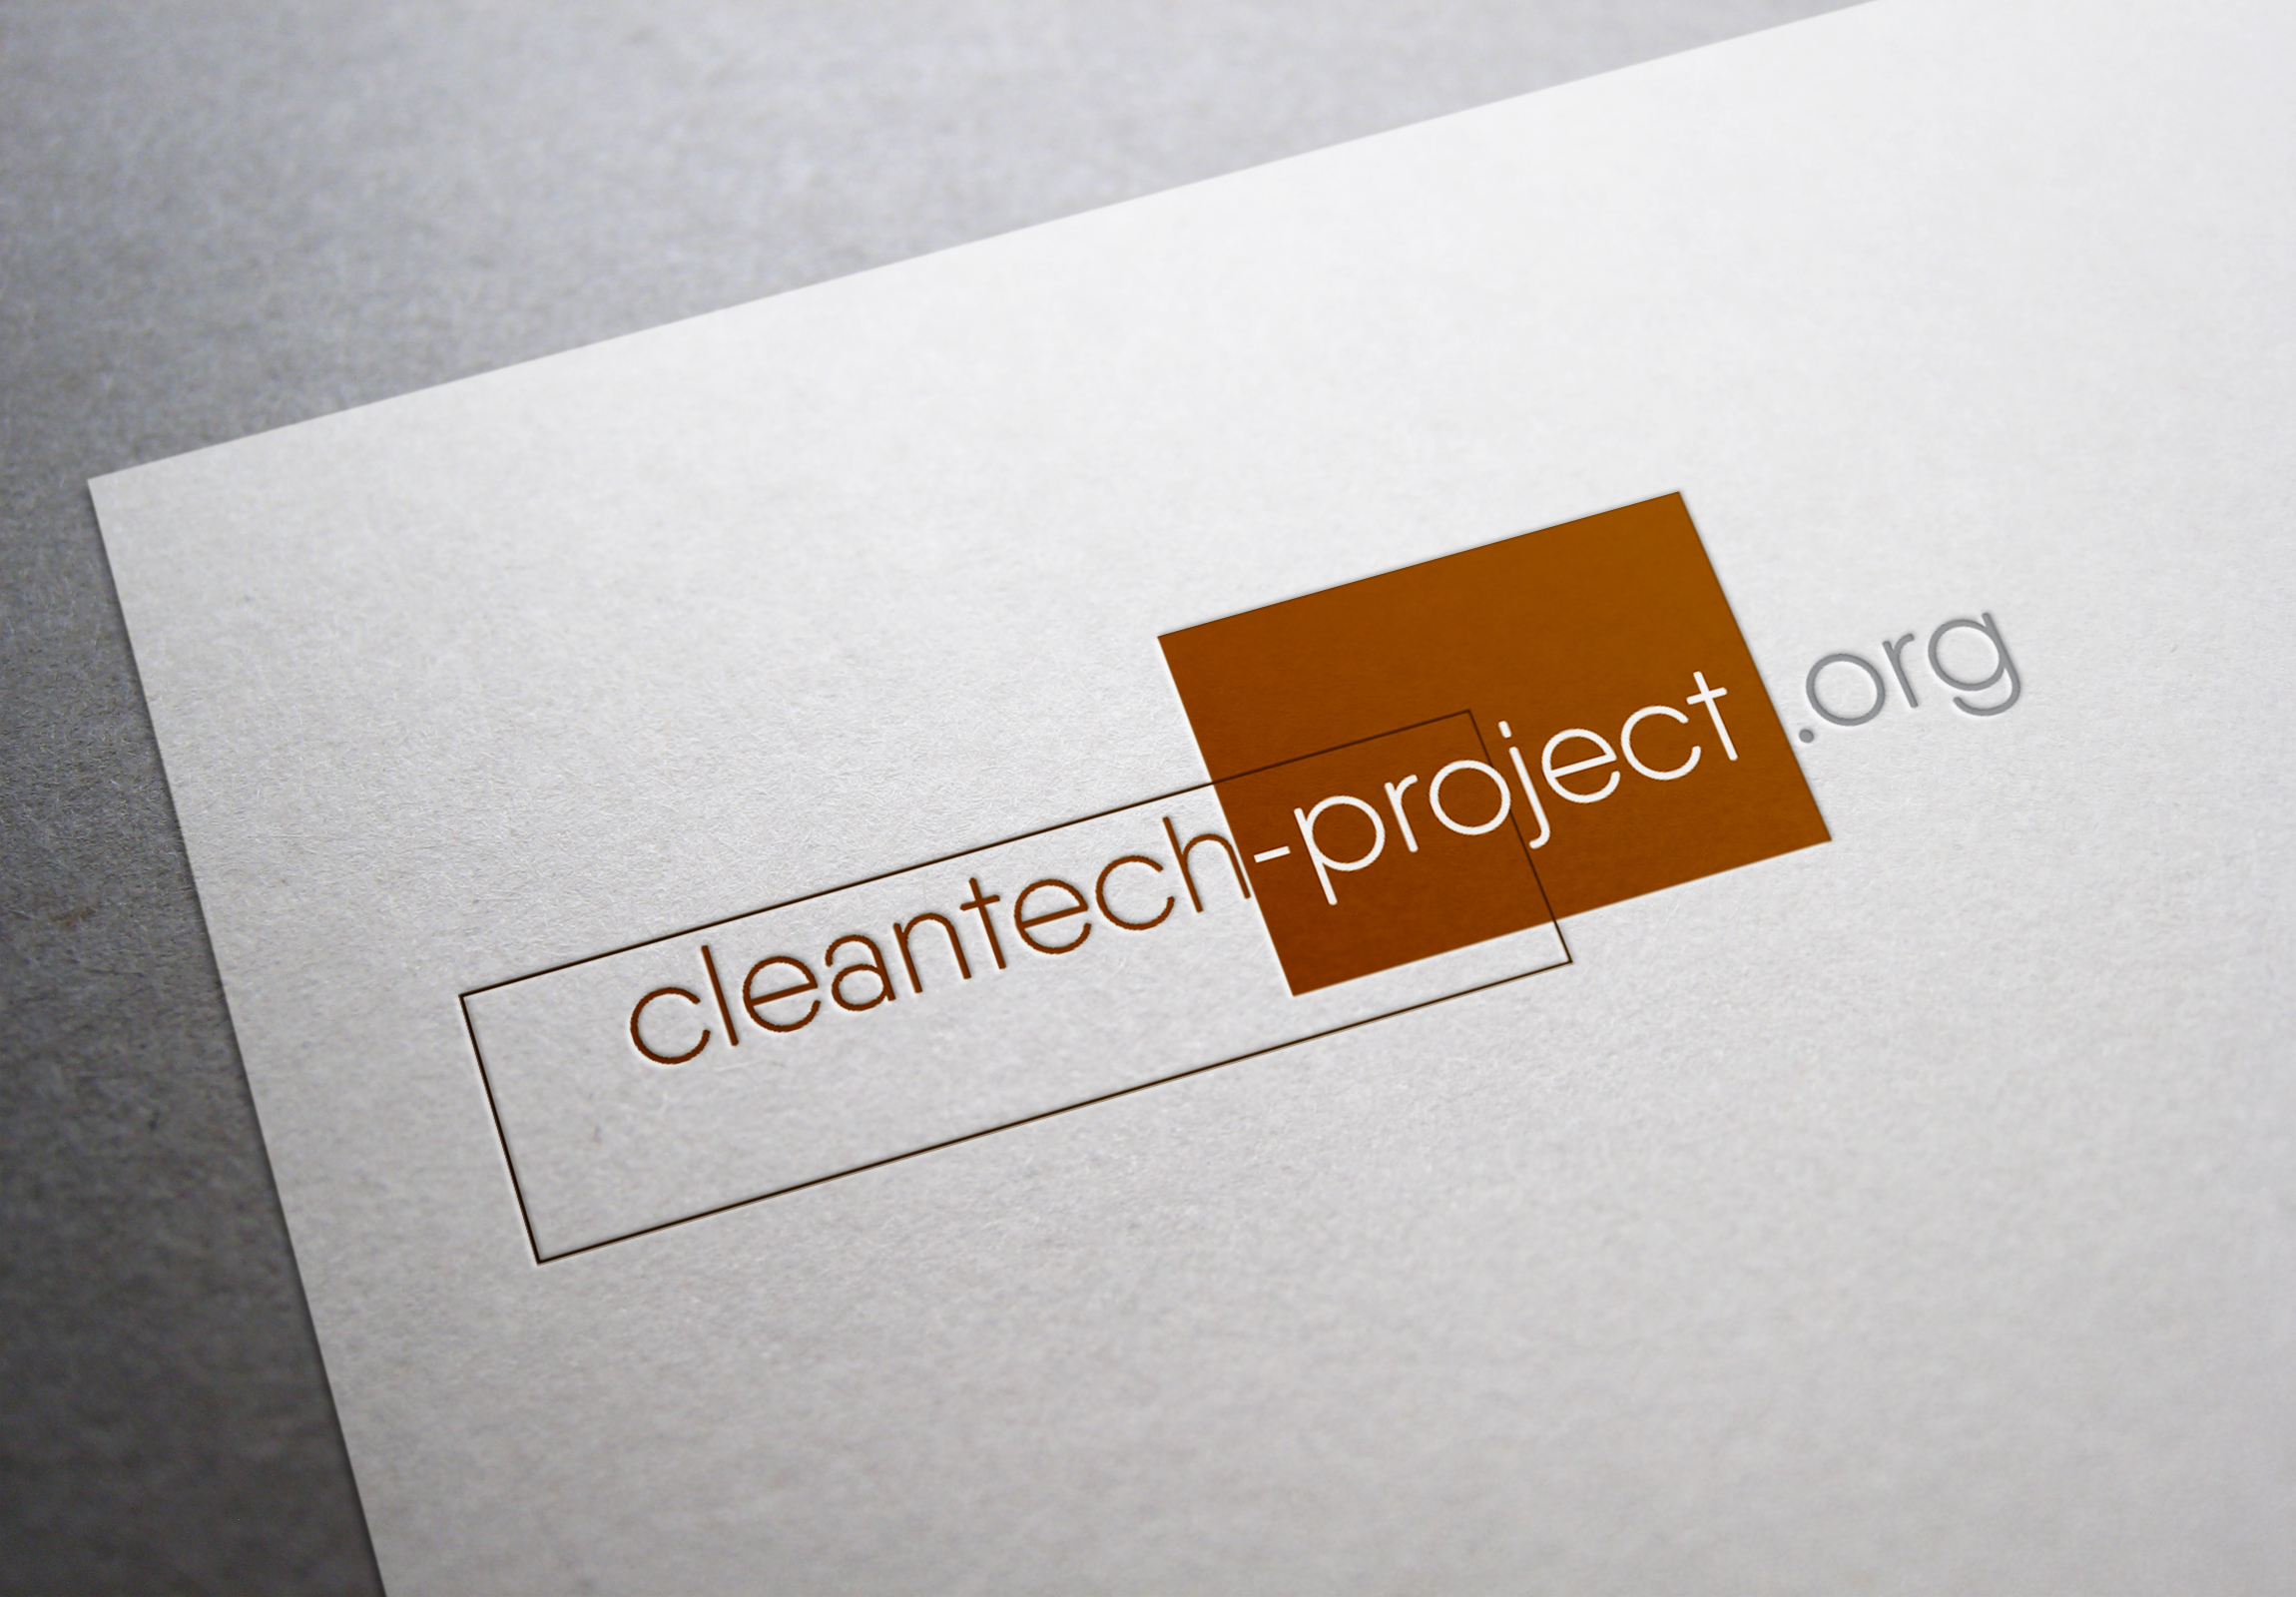 myCleantechEnergy Expertise& Analyse™ - Individual Beratungsauftrag auf Regie und individuellem Aufwand for «my renewable cleantech energy project» ab... K20190323-00-D15 Let's developp your renewable project togheter